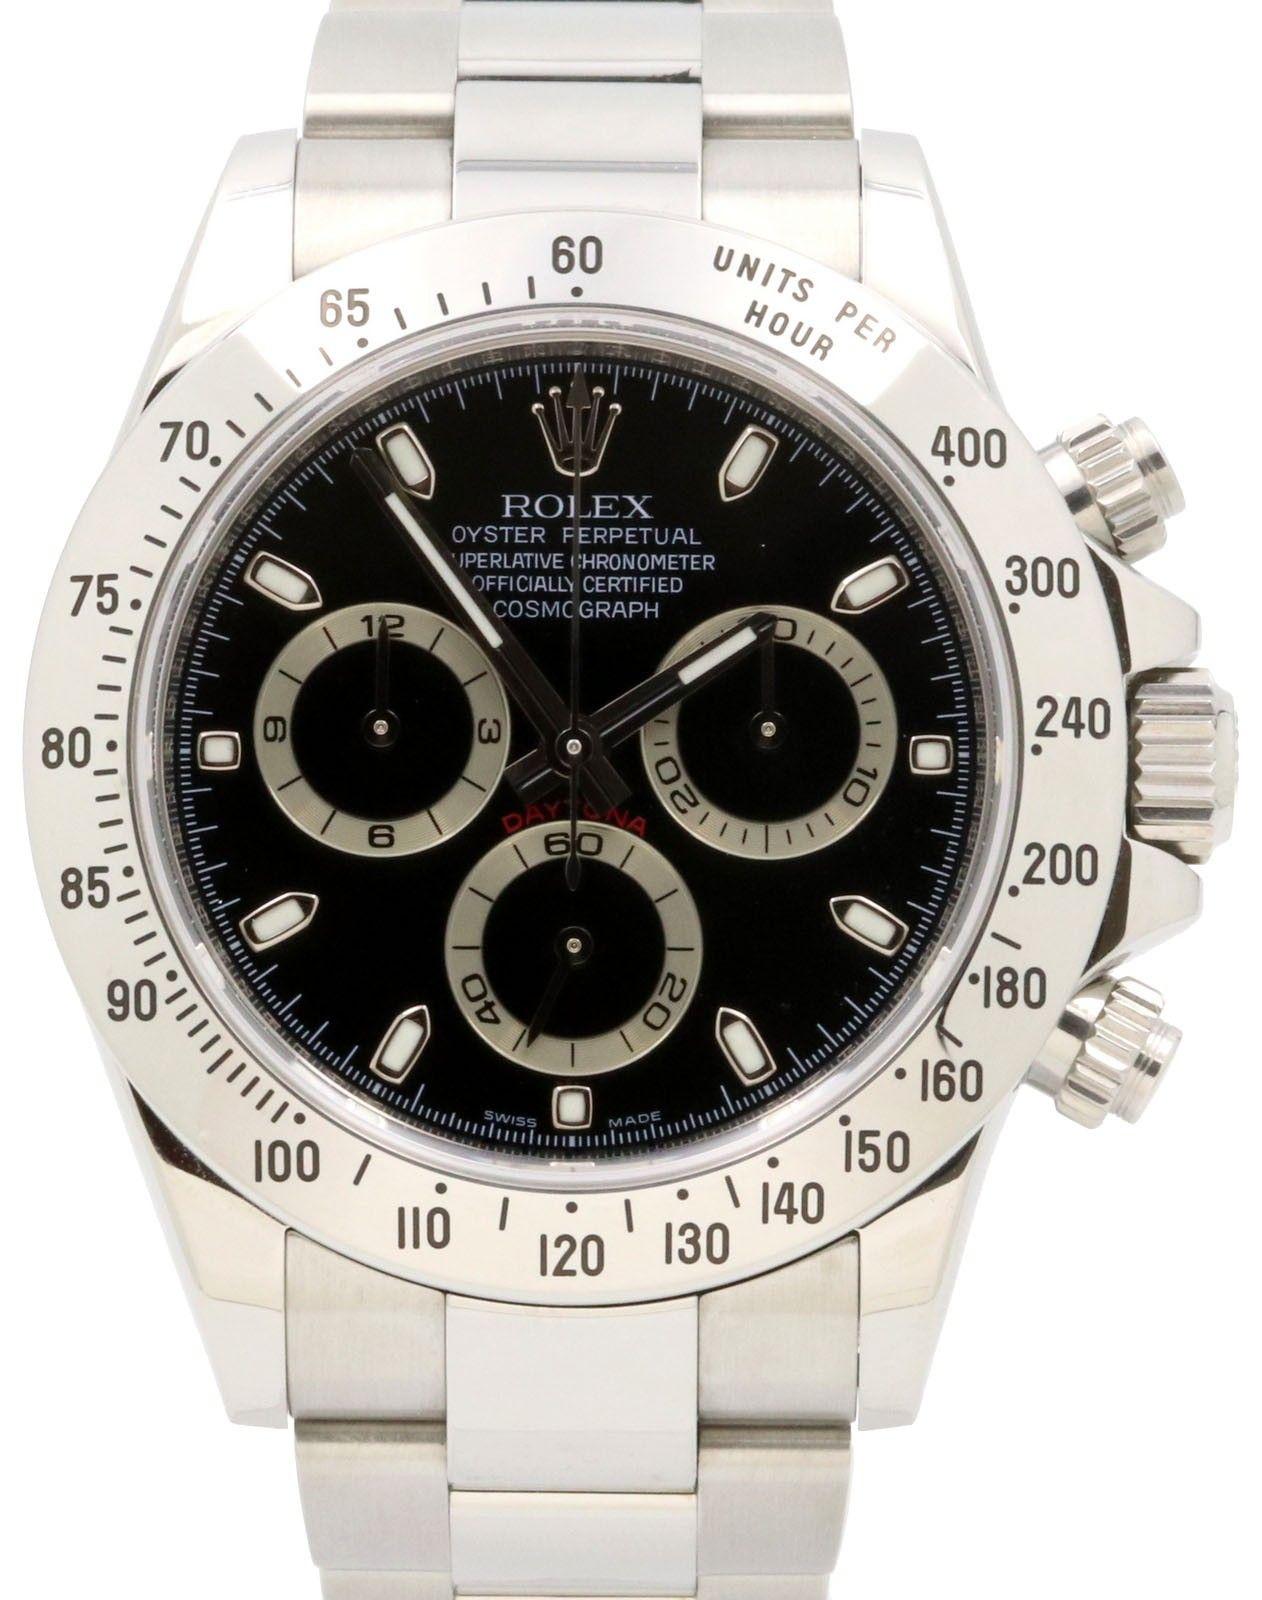 Rolex Daytona 116520 Black Index Stainless Steel Oyster Men S 40mm Box Papers Rolex Rolex Daytona Watch Rolex Daytona